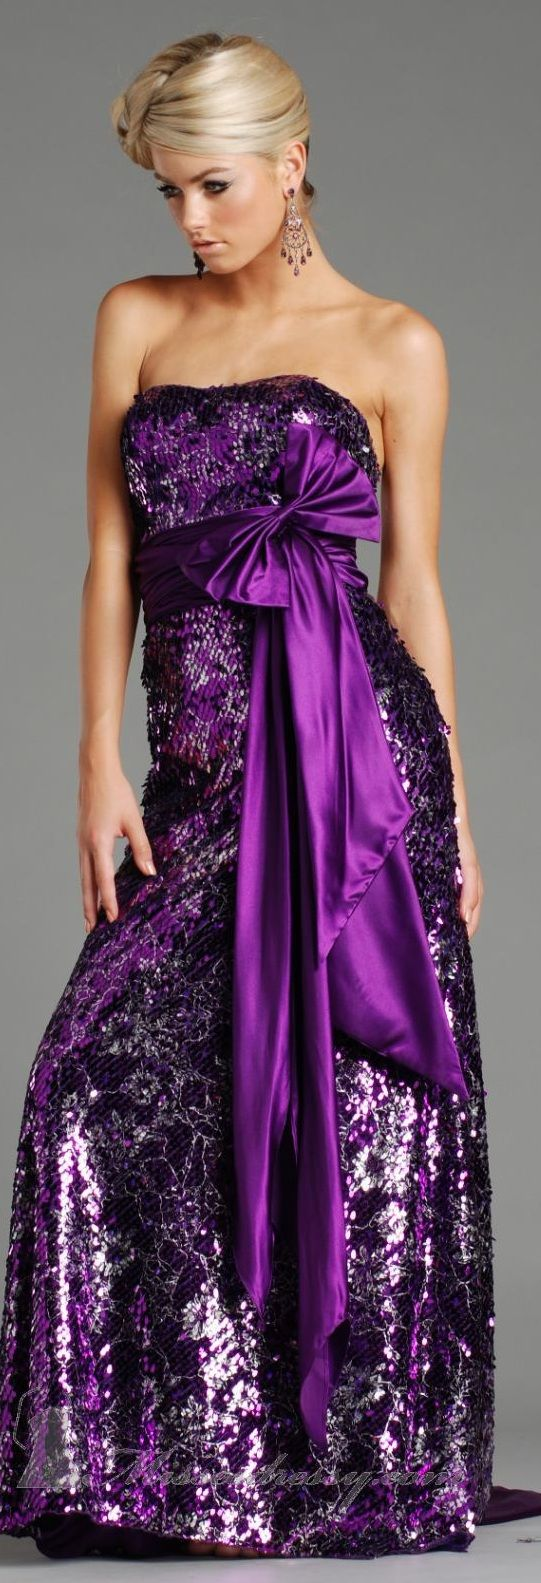 1000  ideas about Purple Evening Gowns on Pinterest  Purple dress ...